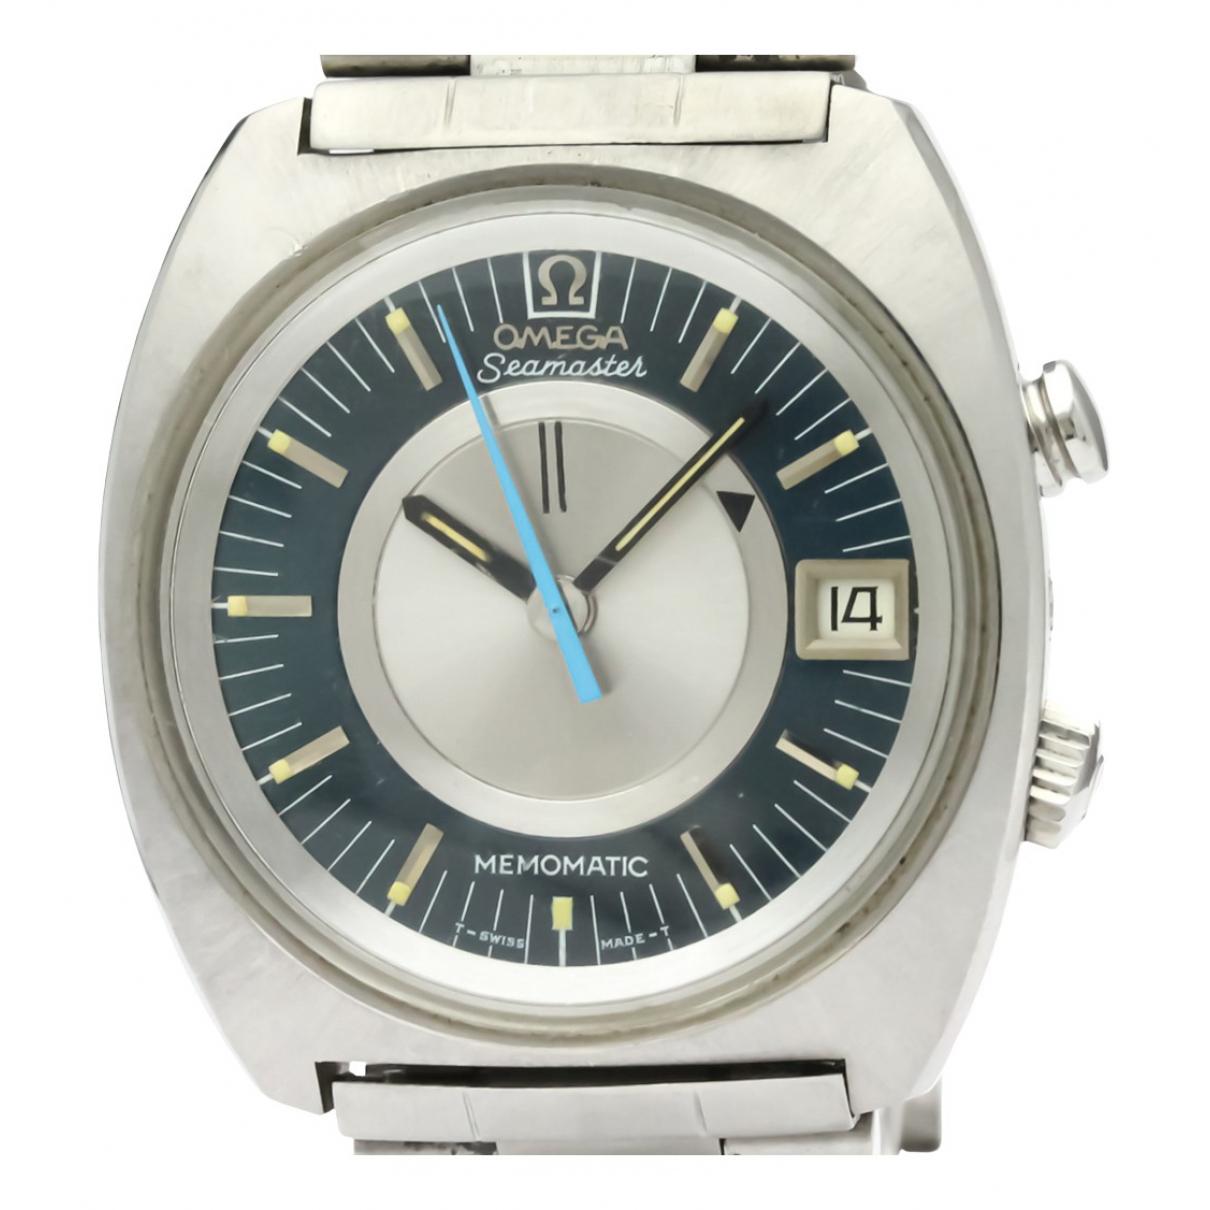 Omega Seamaster Uhr in  Silber Stahl